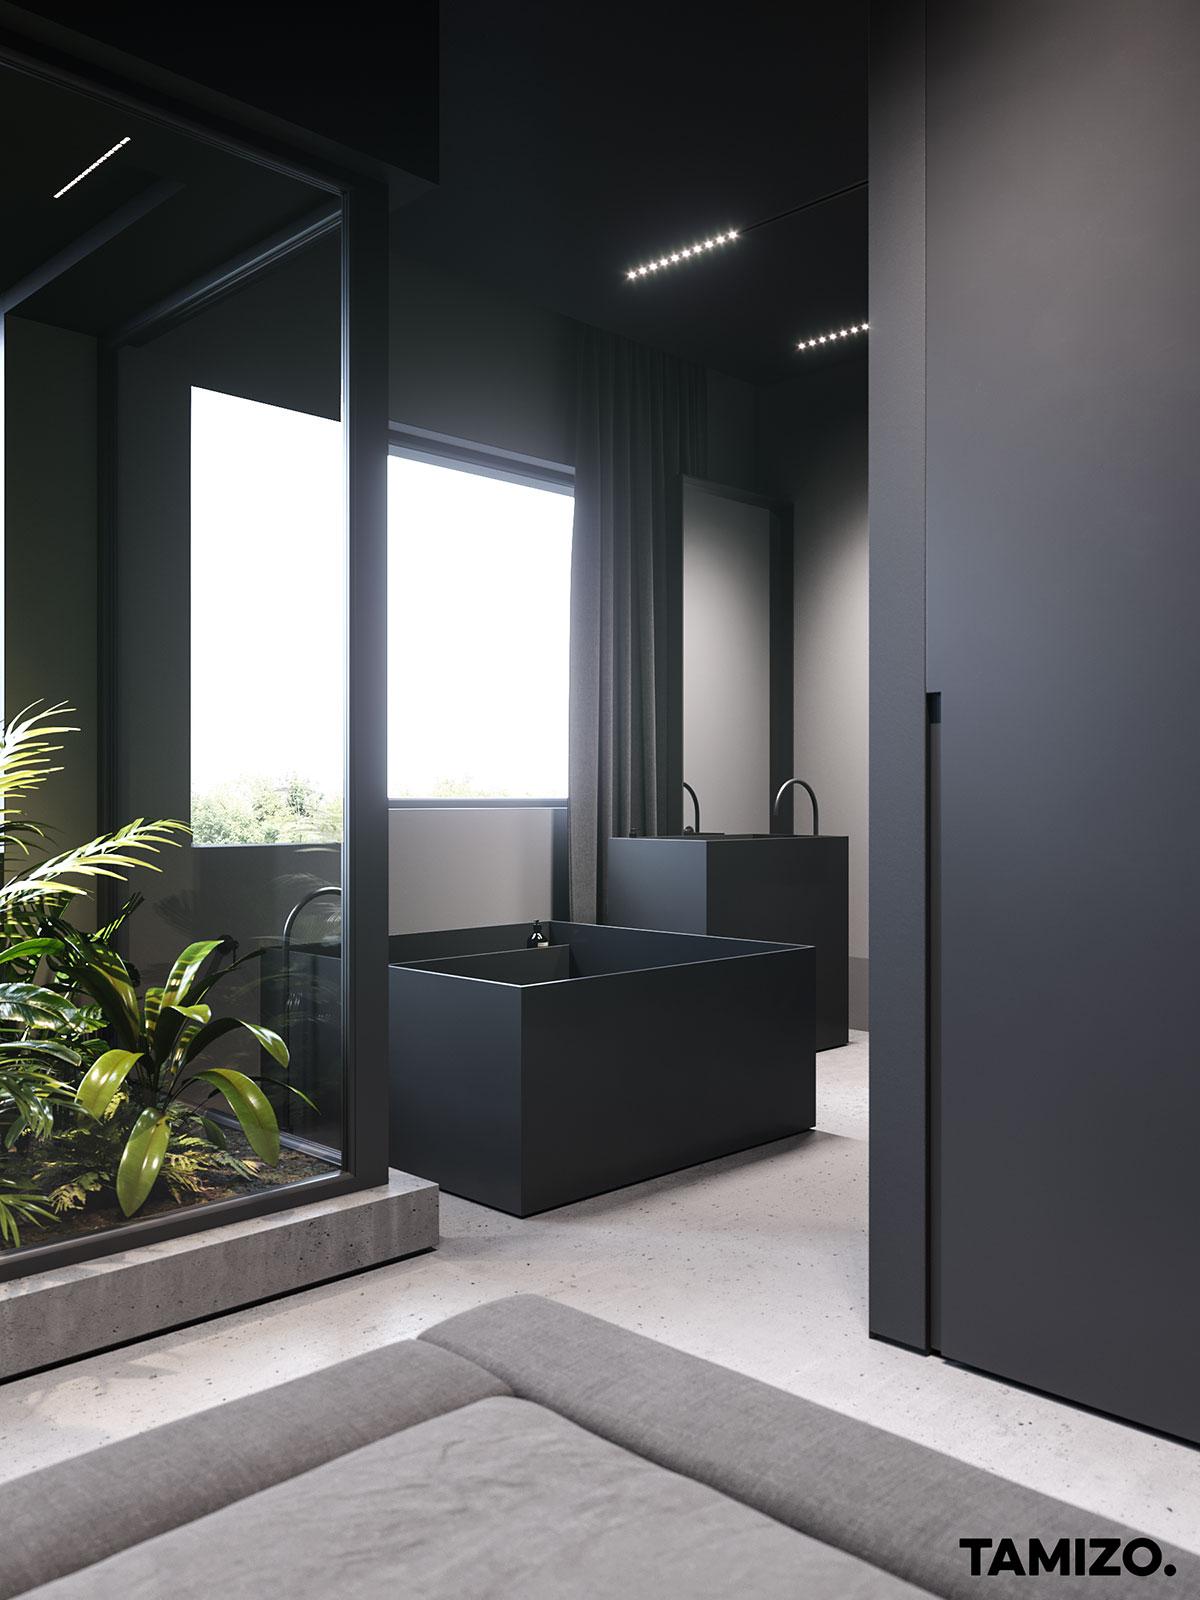 tamizo_architects_mateusz_kuo_stolarski_poznan_iterior_design_apartment_penthouse_10